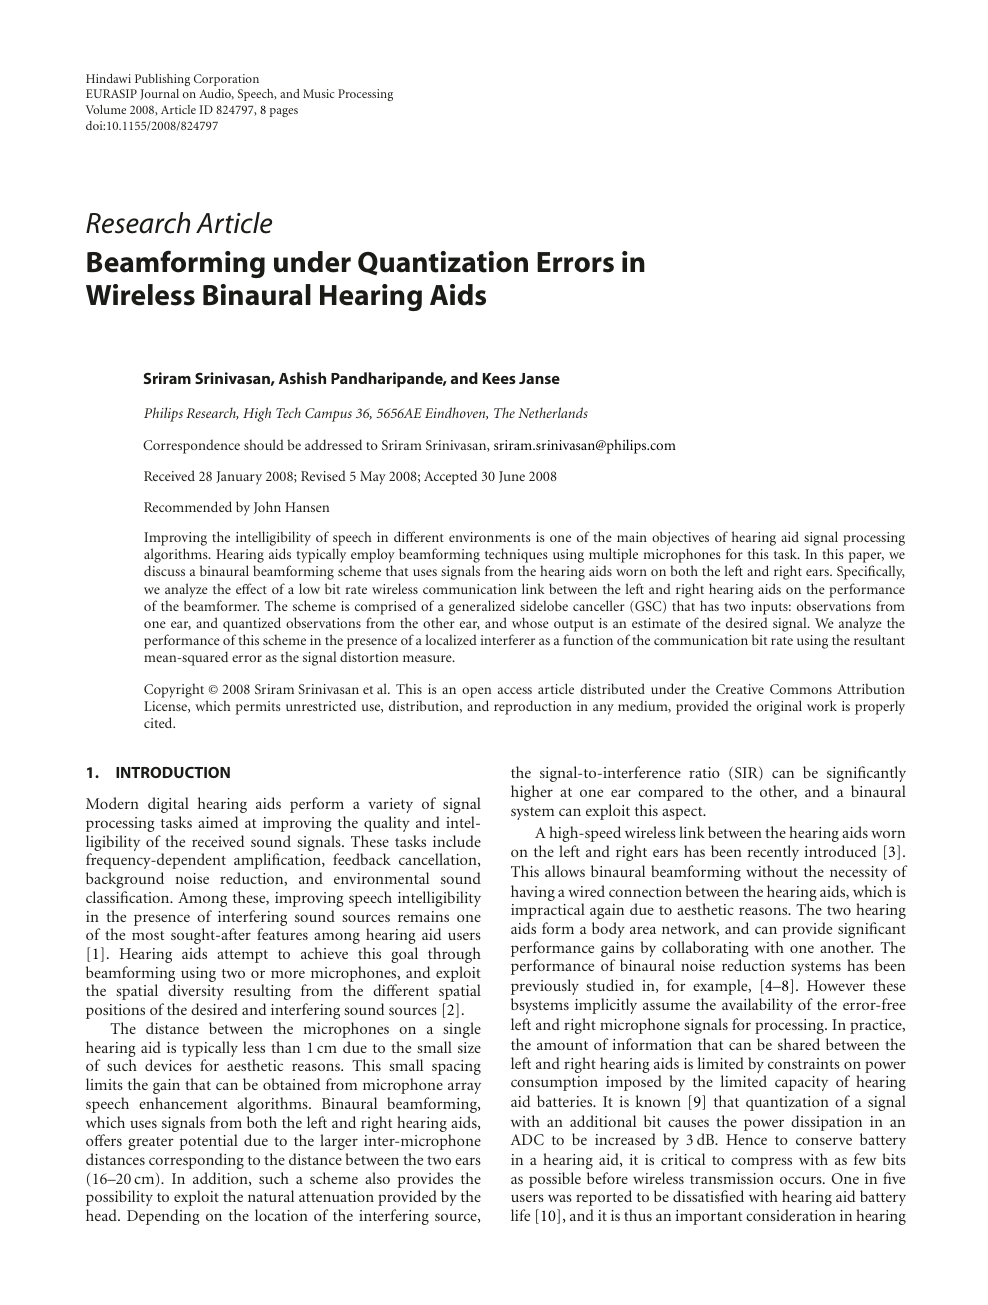 Beamforming under Quantization Errors in Wireless Binaural